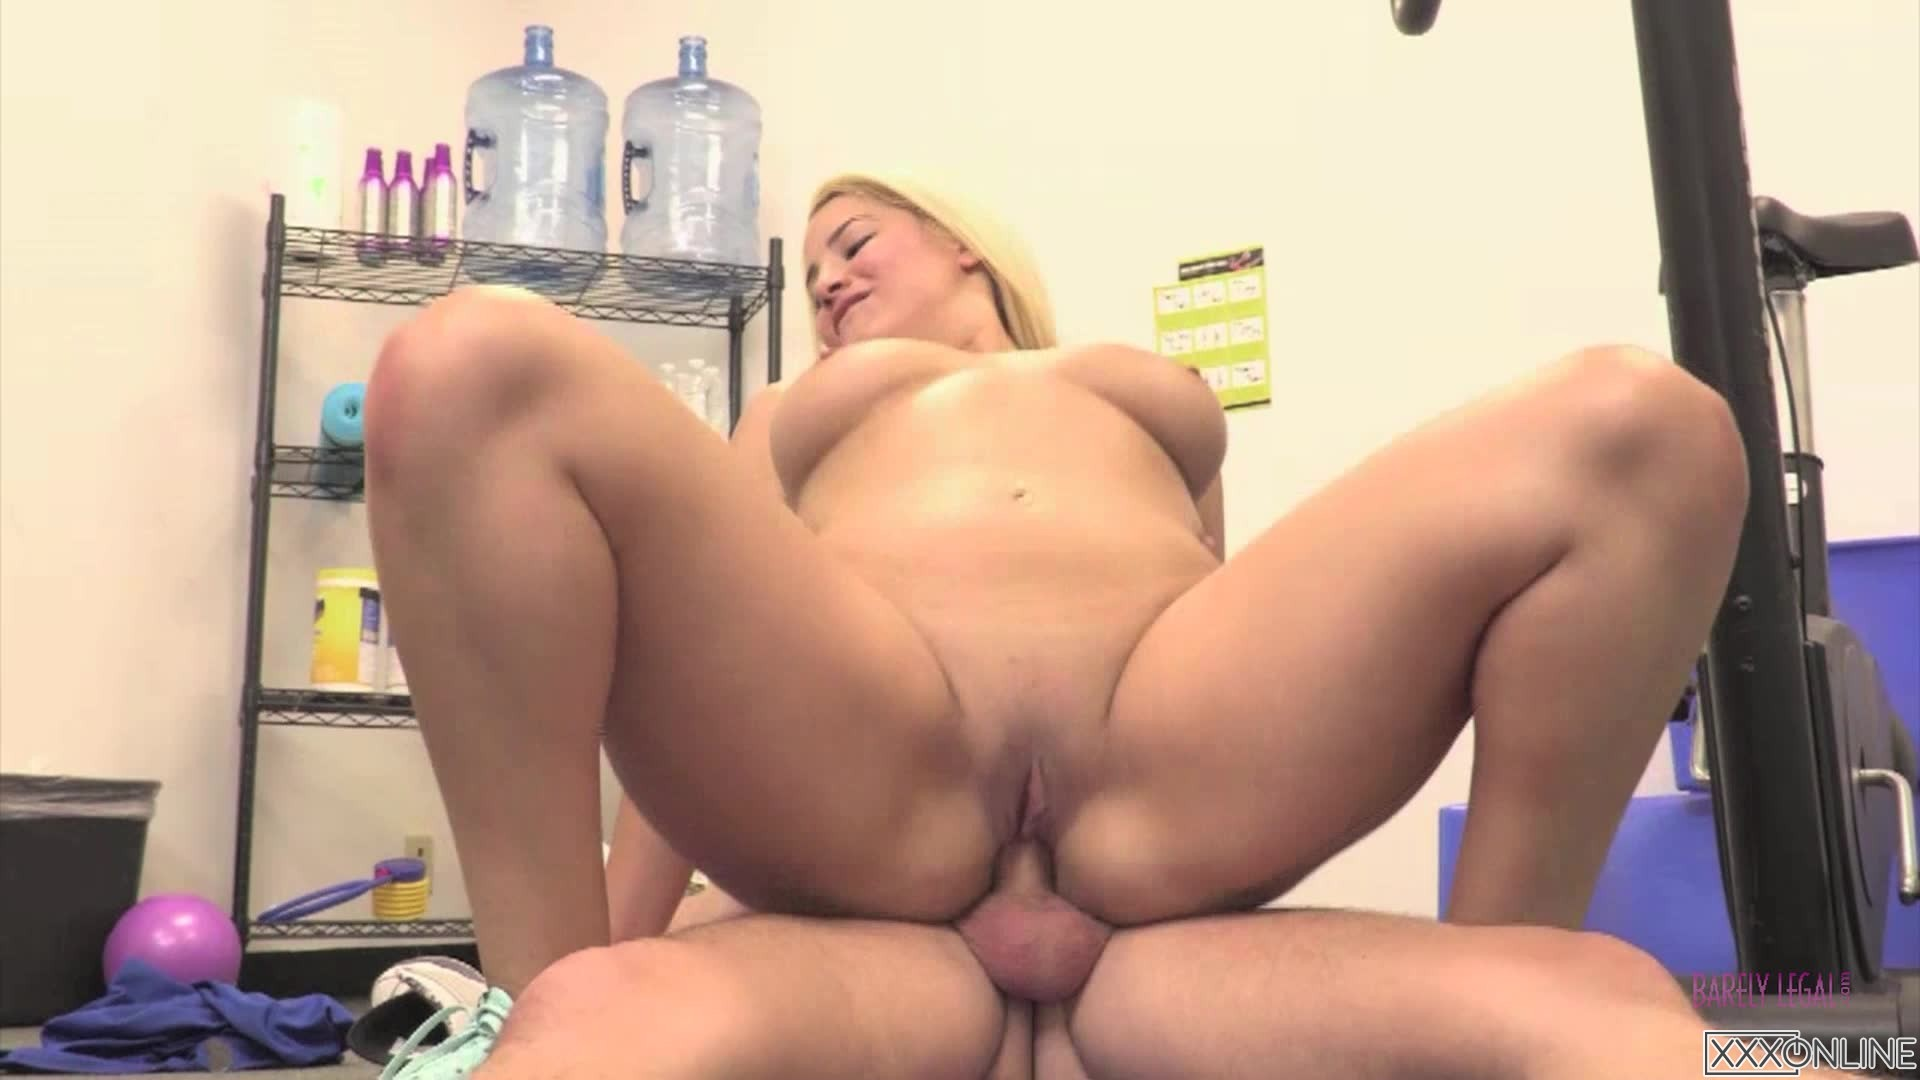 Alan Stafford Porn Exercise barelylegal – curvy girl sexercise 2018 petite – xxx online